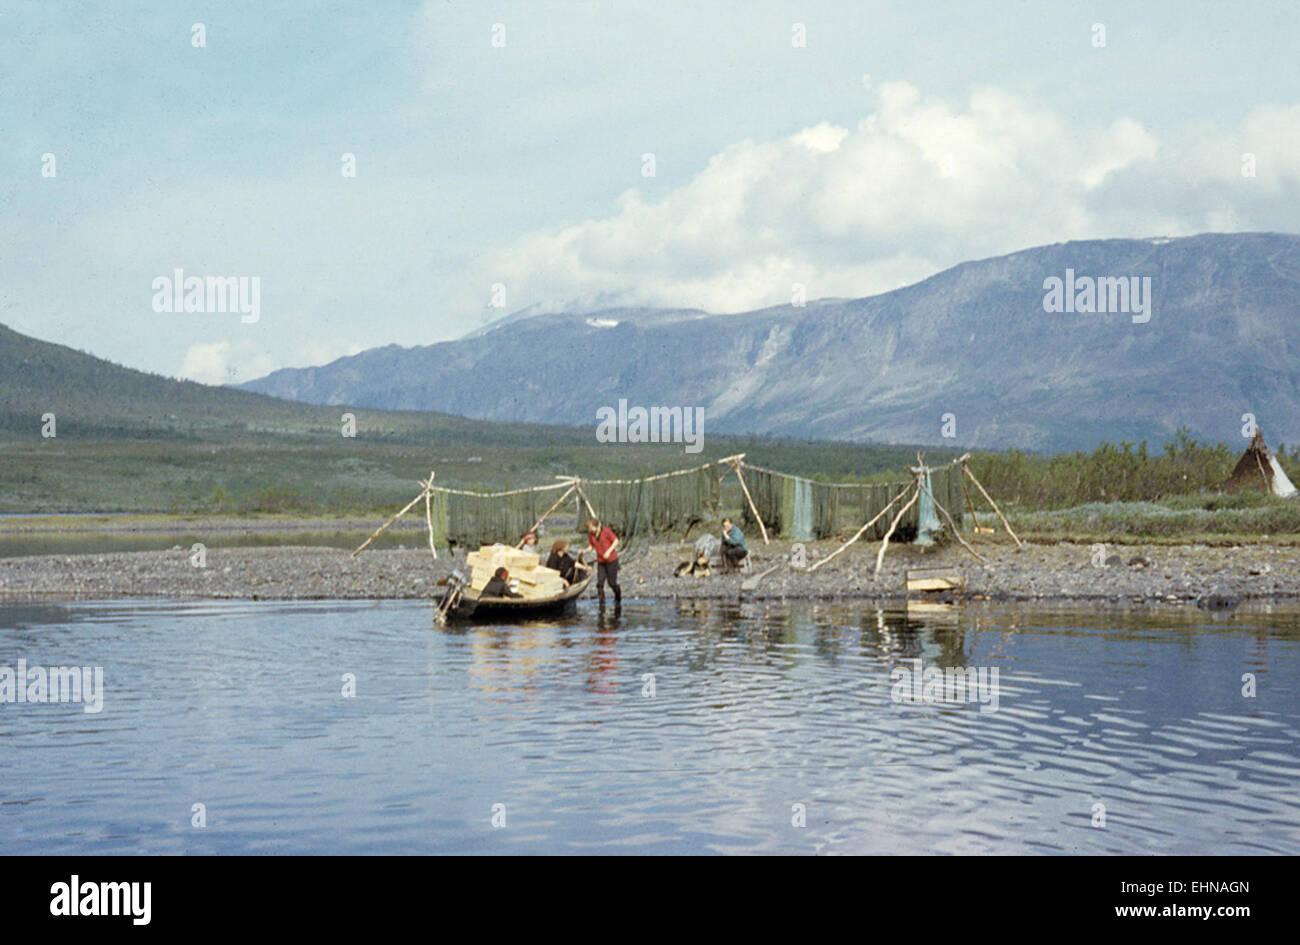 Satisjaure (Satihaure), Gällivare, Lappland - Stock Image